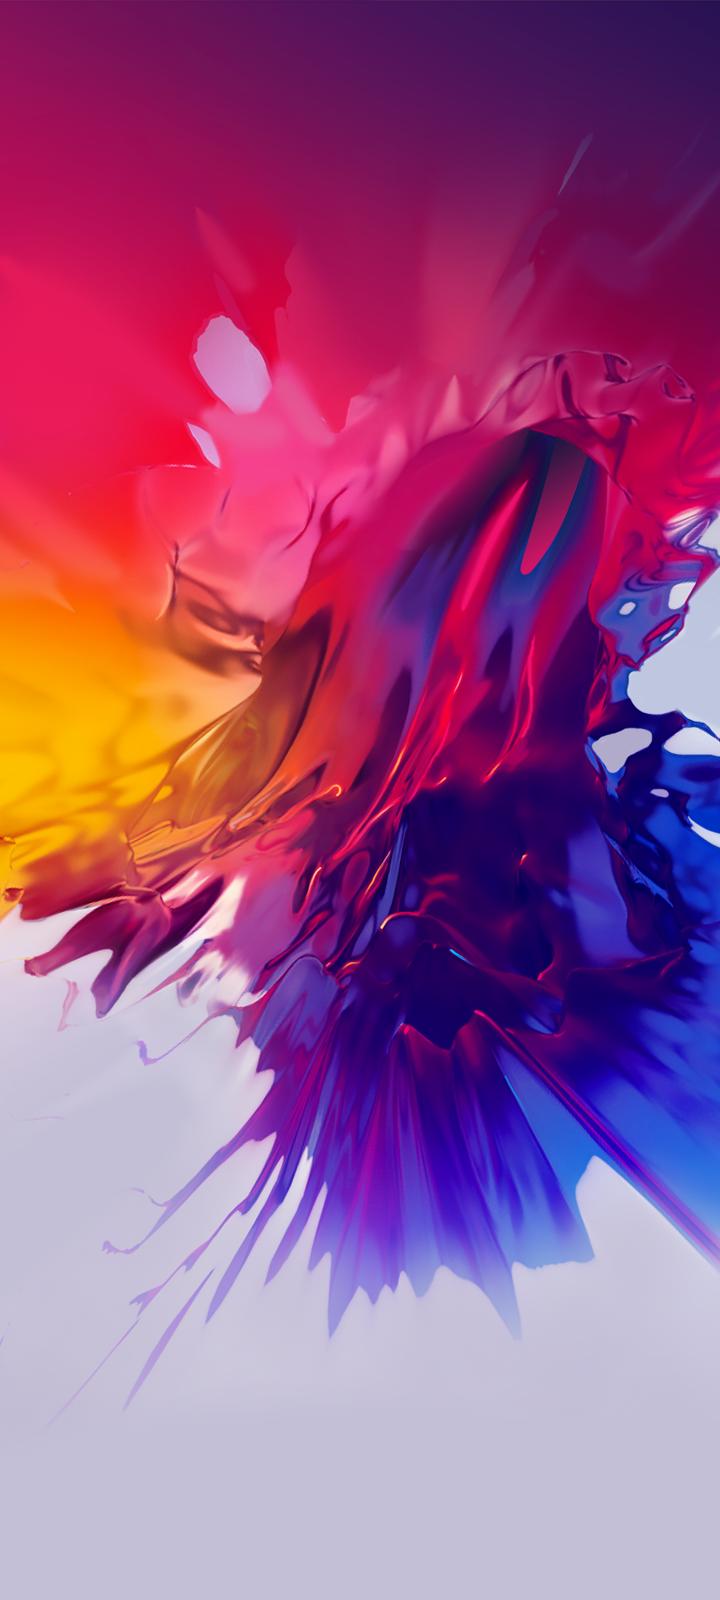 Download Infinix Hot 8 Stock Wallpapers Fhd Phone Wallpaper